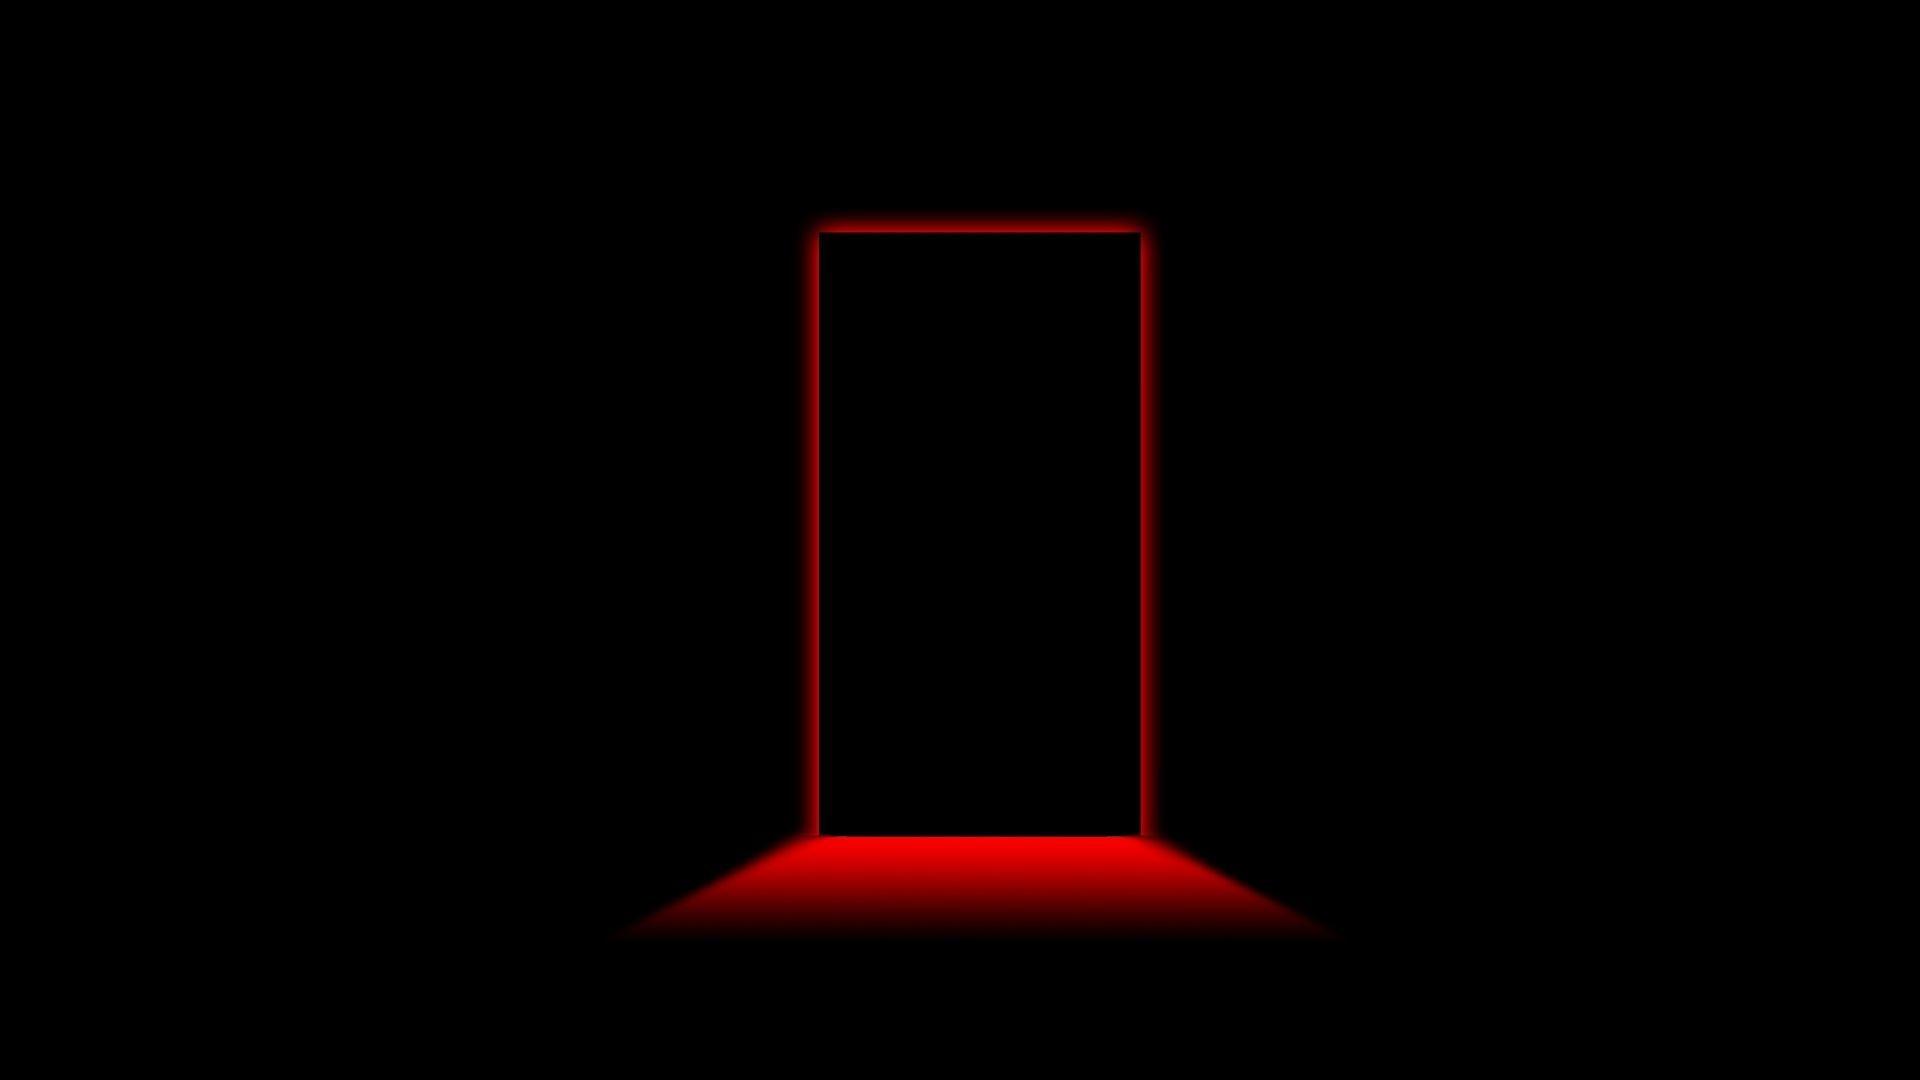 Res: 1920x1080, Door light shadow black red wallpaper mixhd wallpapers | Chainimage